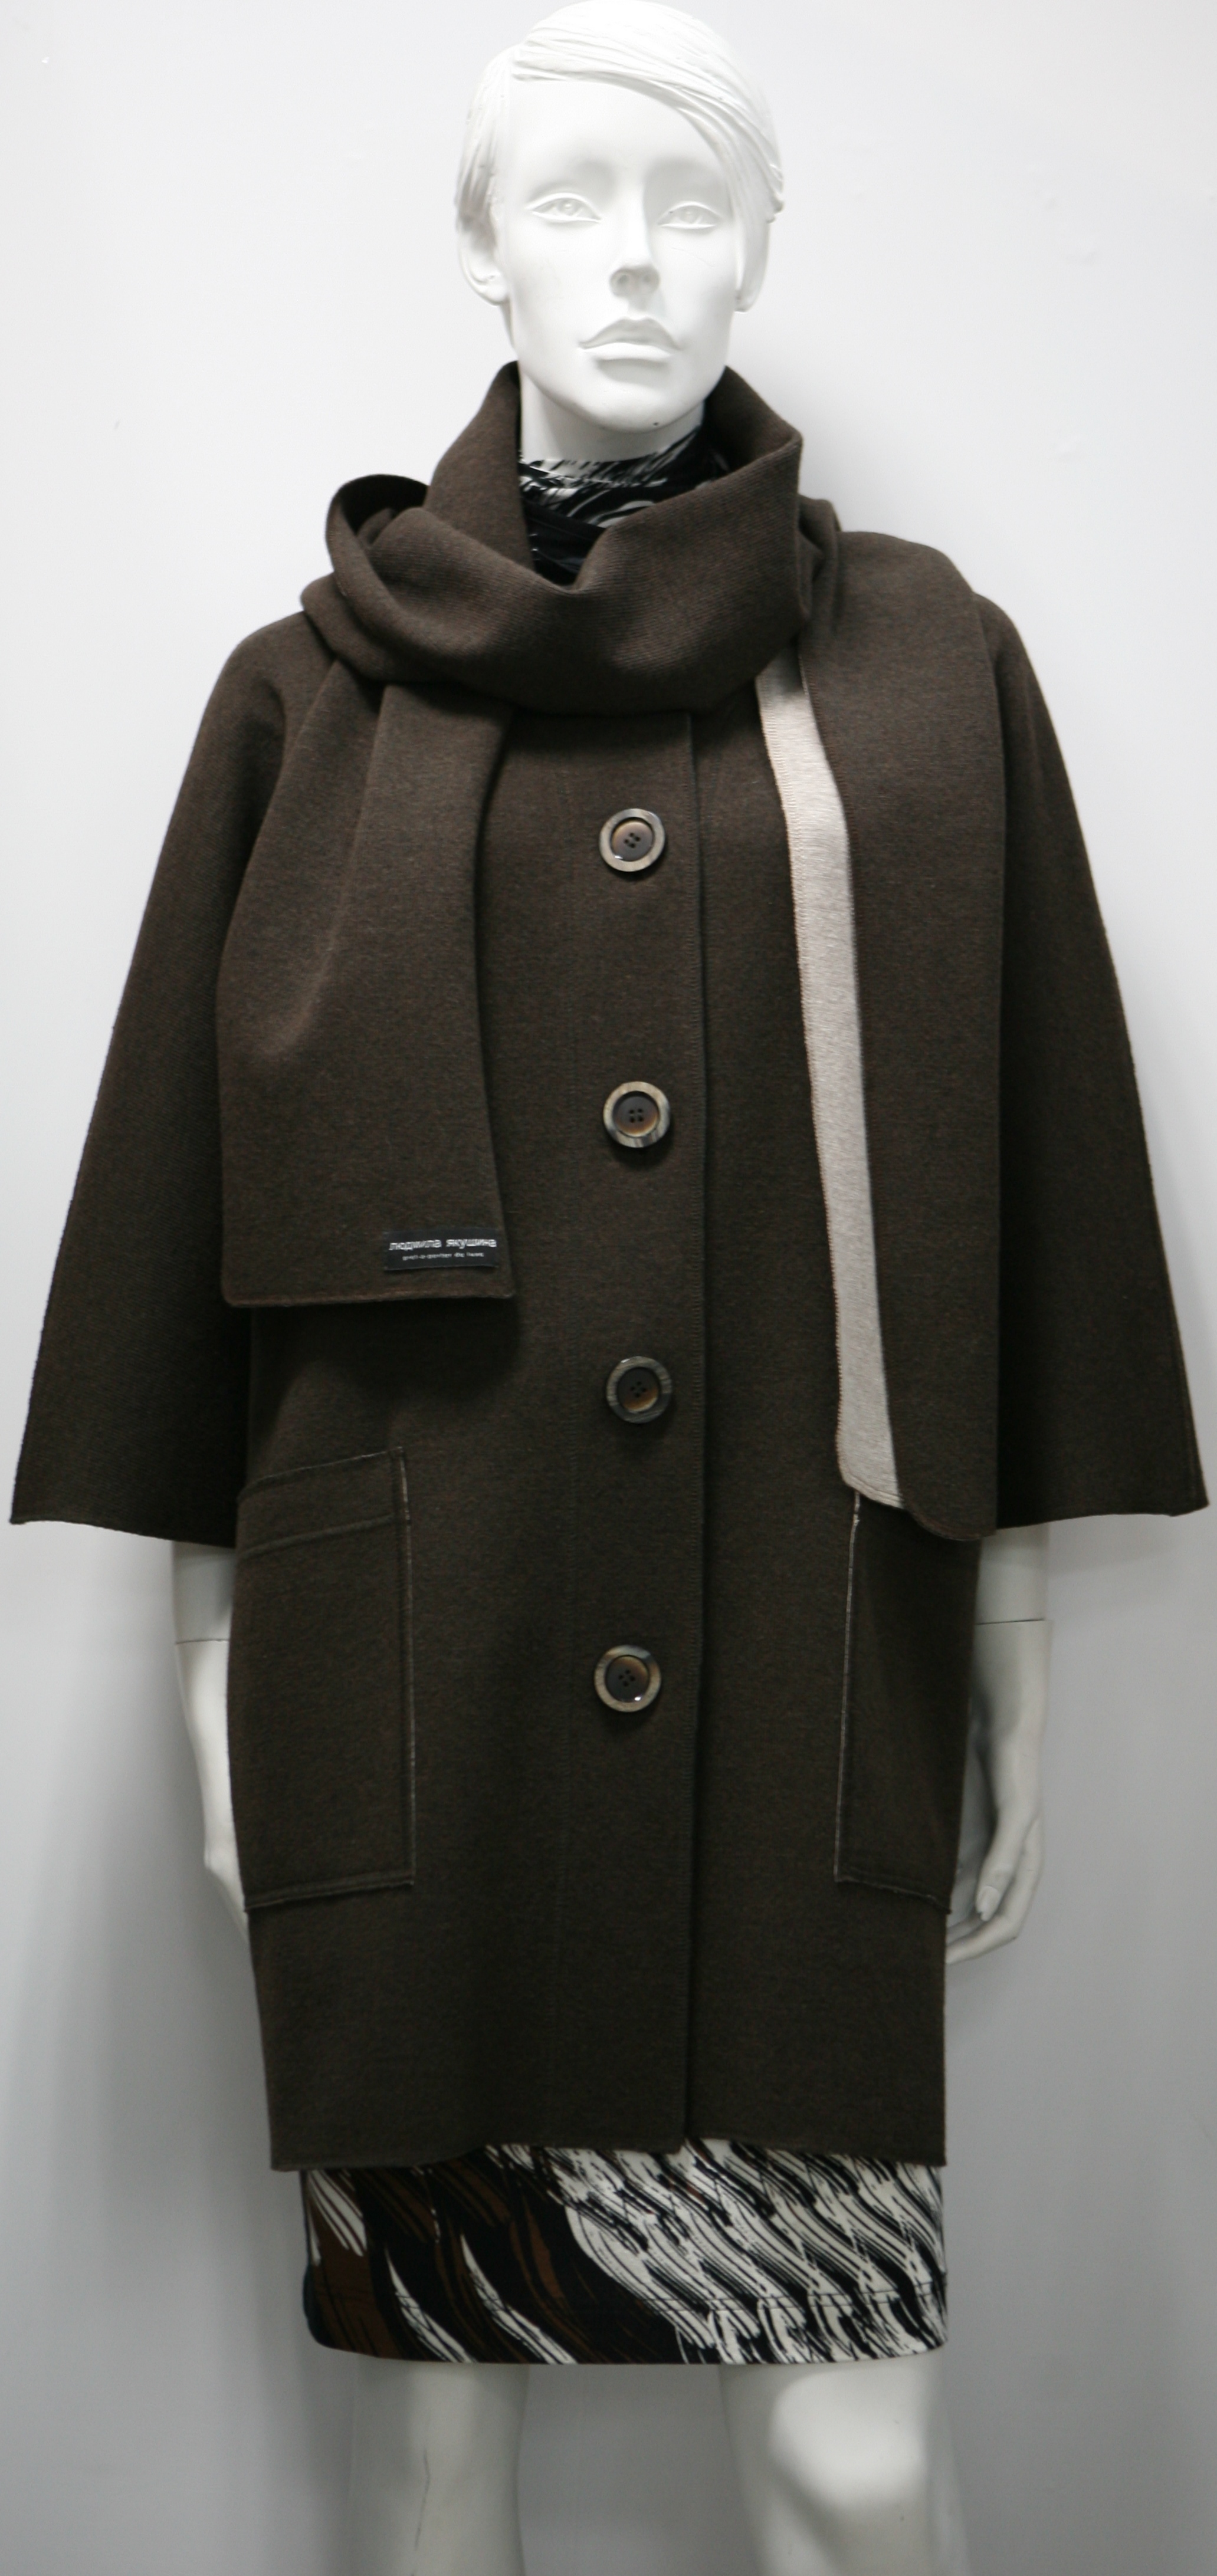 2052 184 500 пальто (20500)